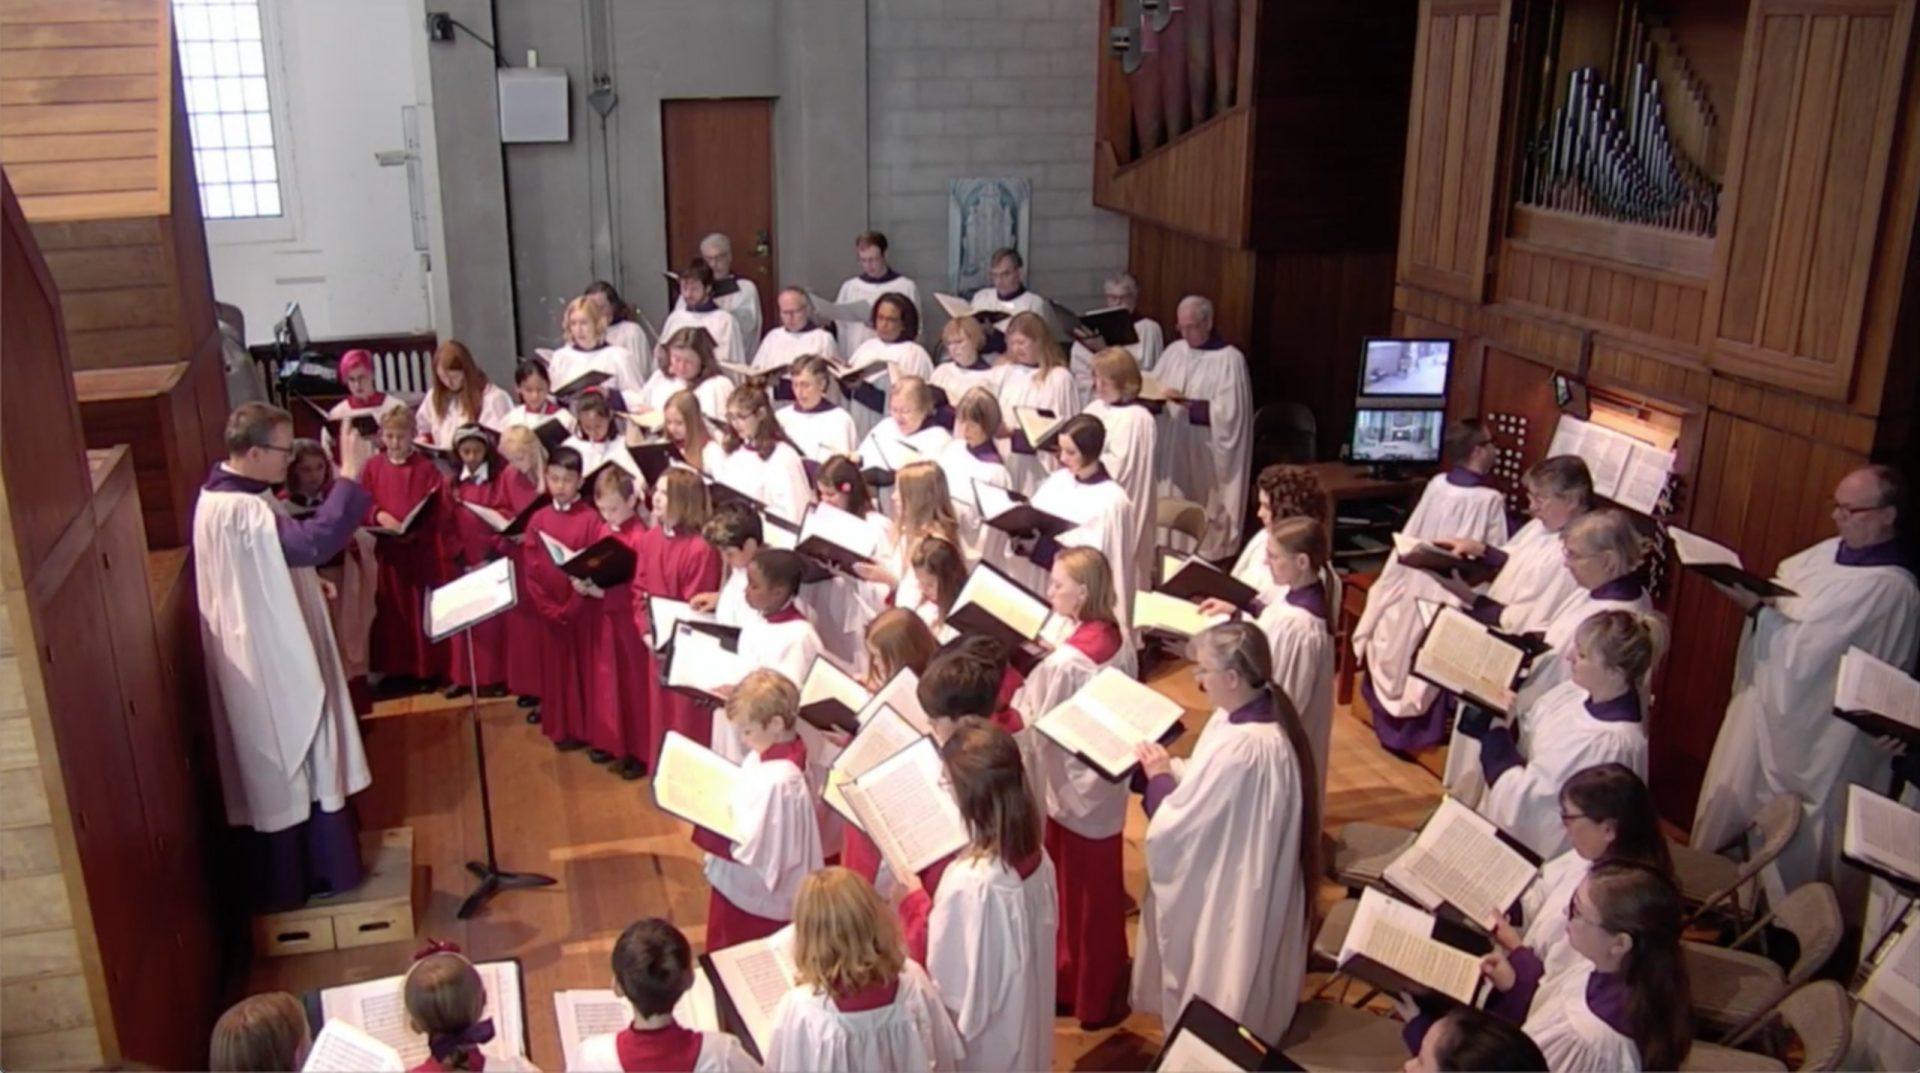 The Eighteenth Sunday After Pentecost